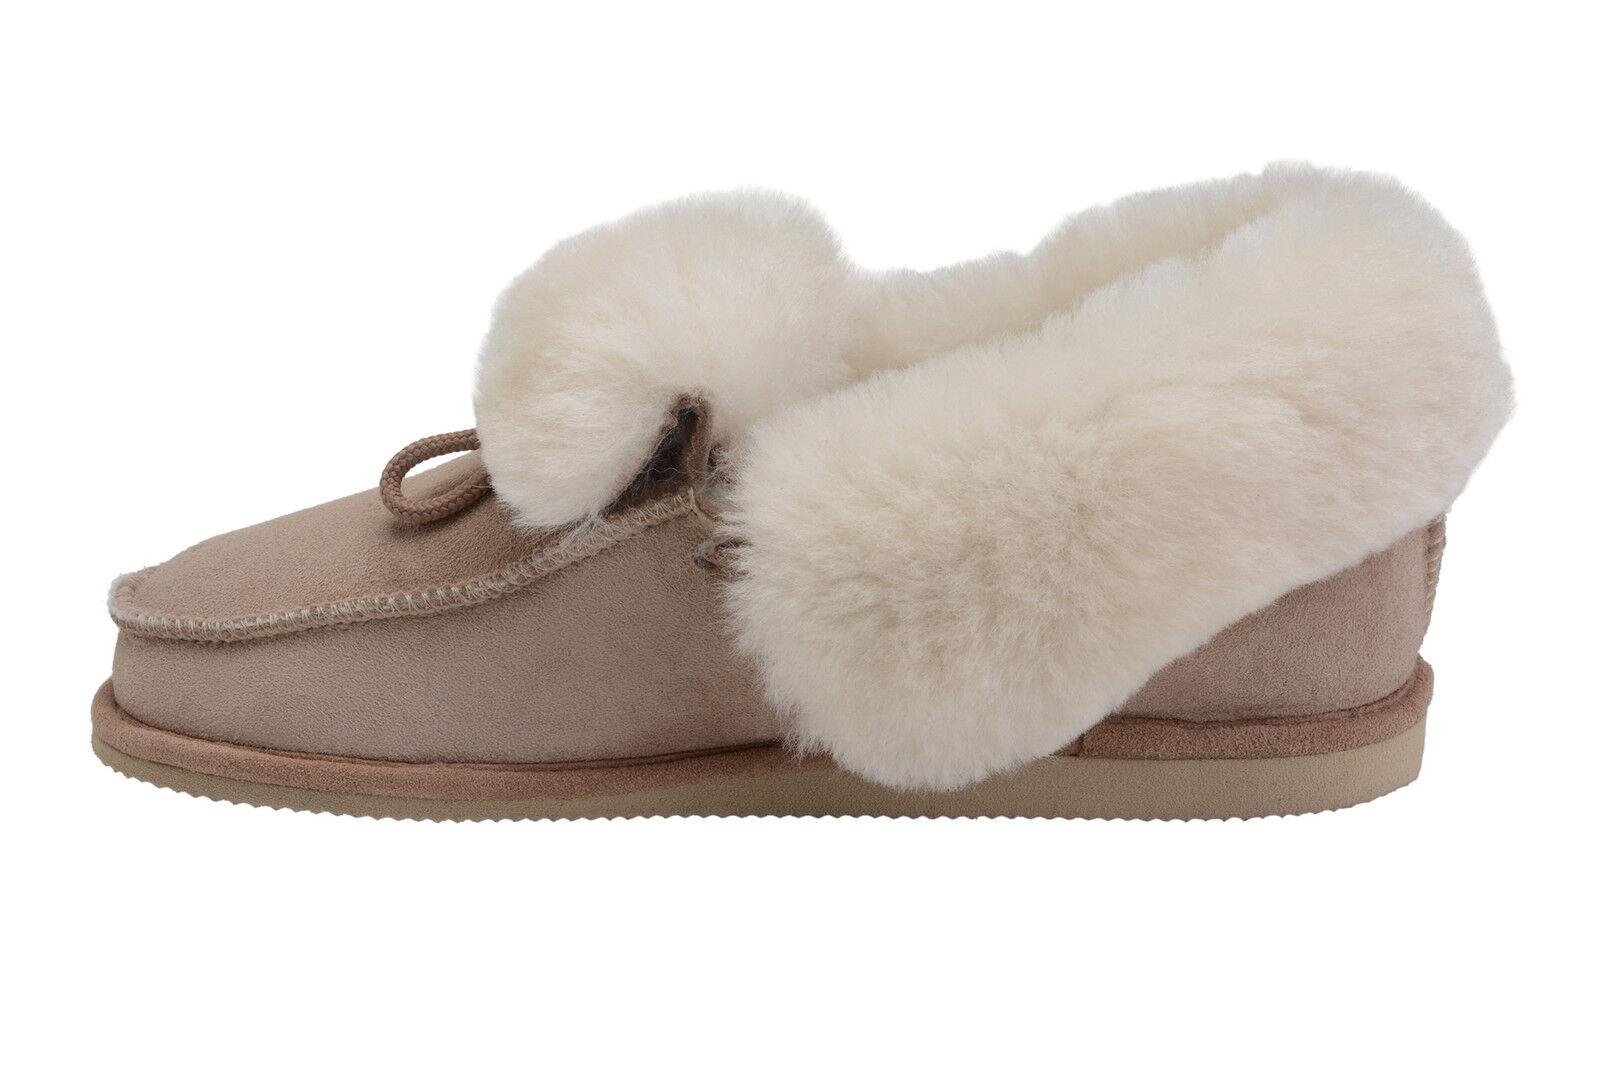 edefc8790 Mens Womens House Sheepskin Moccasin Slippers 100% Wool Lining Shoes UK Sz  3-10